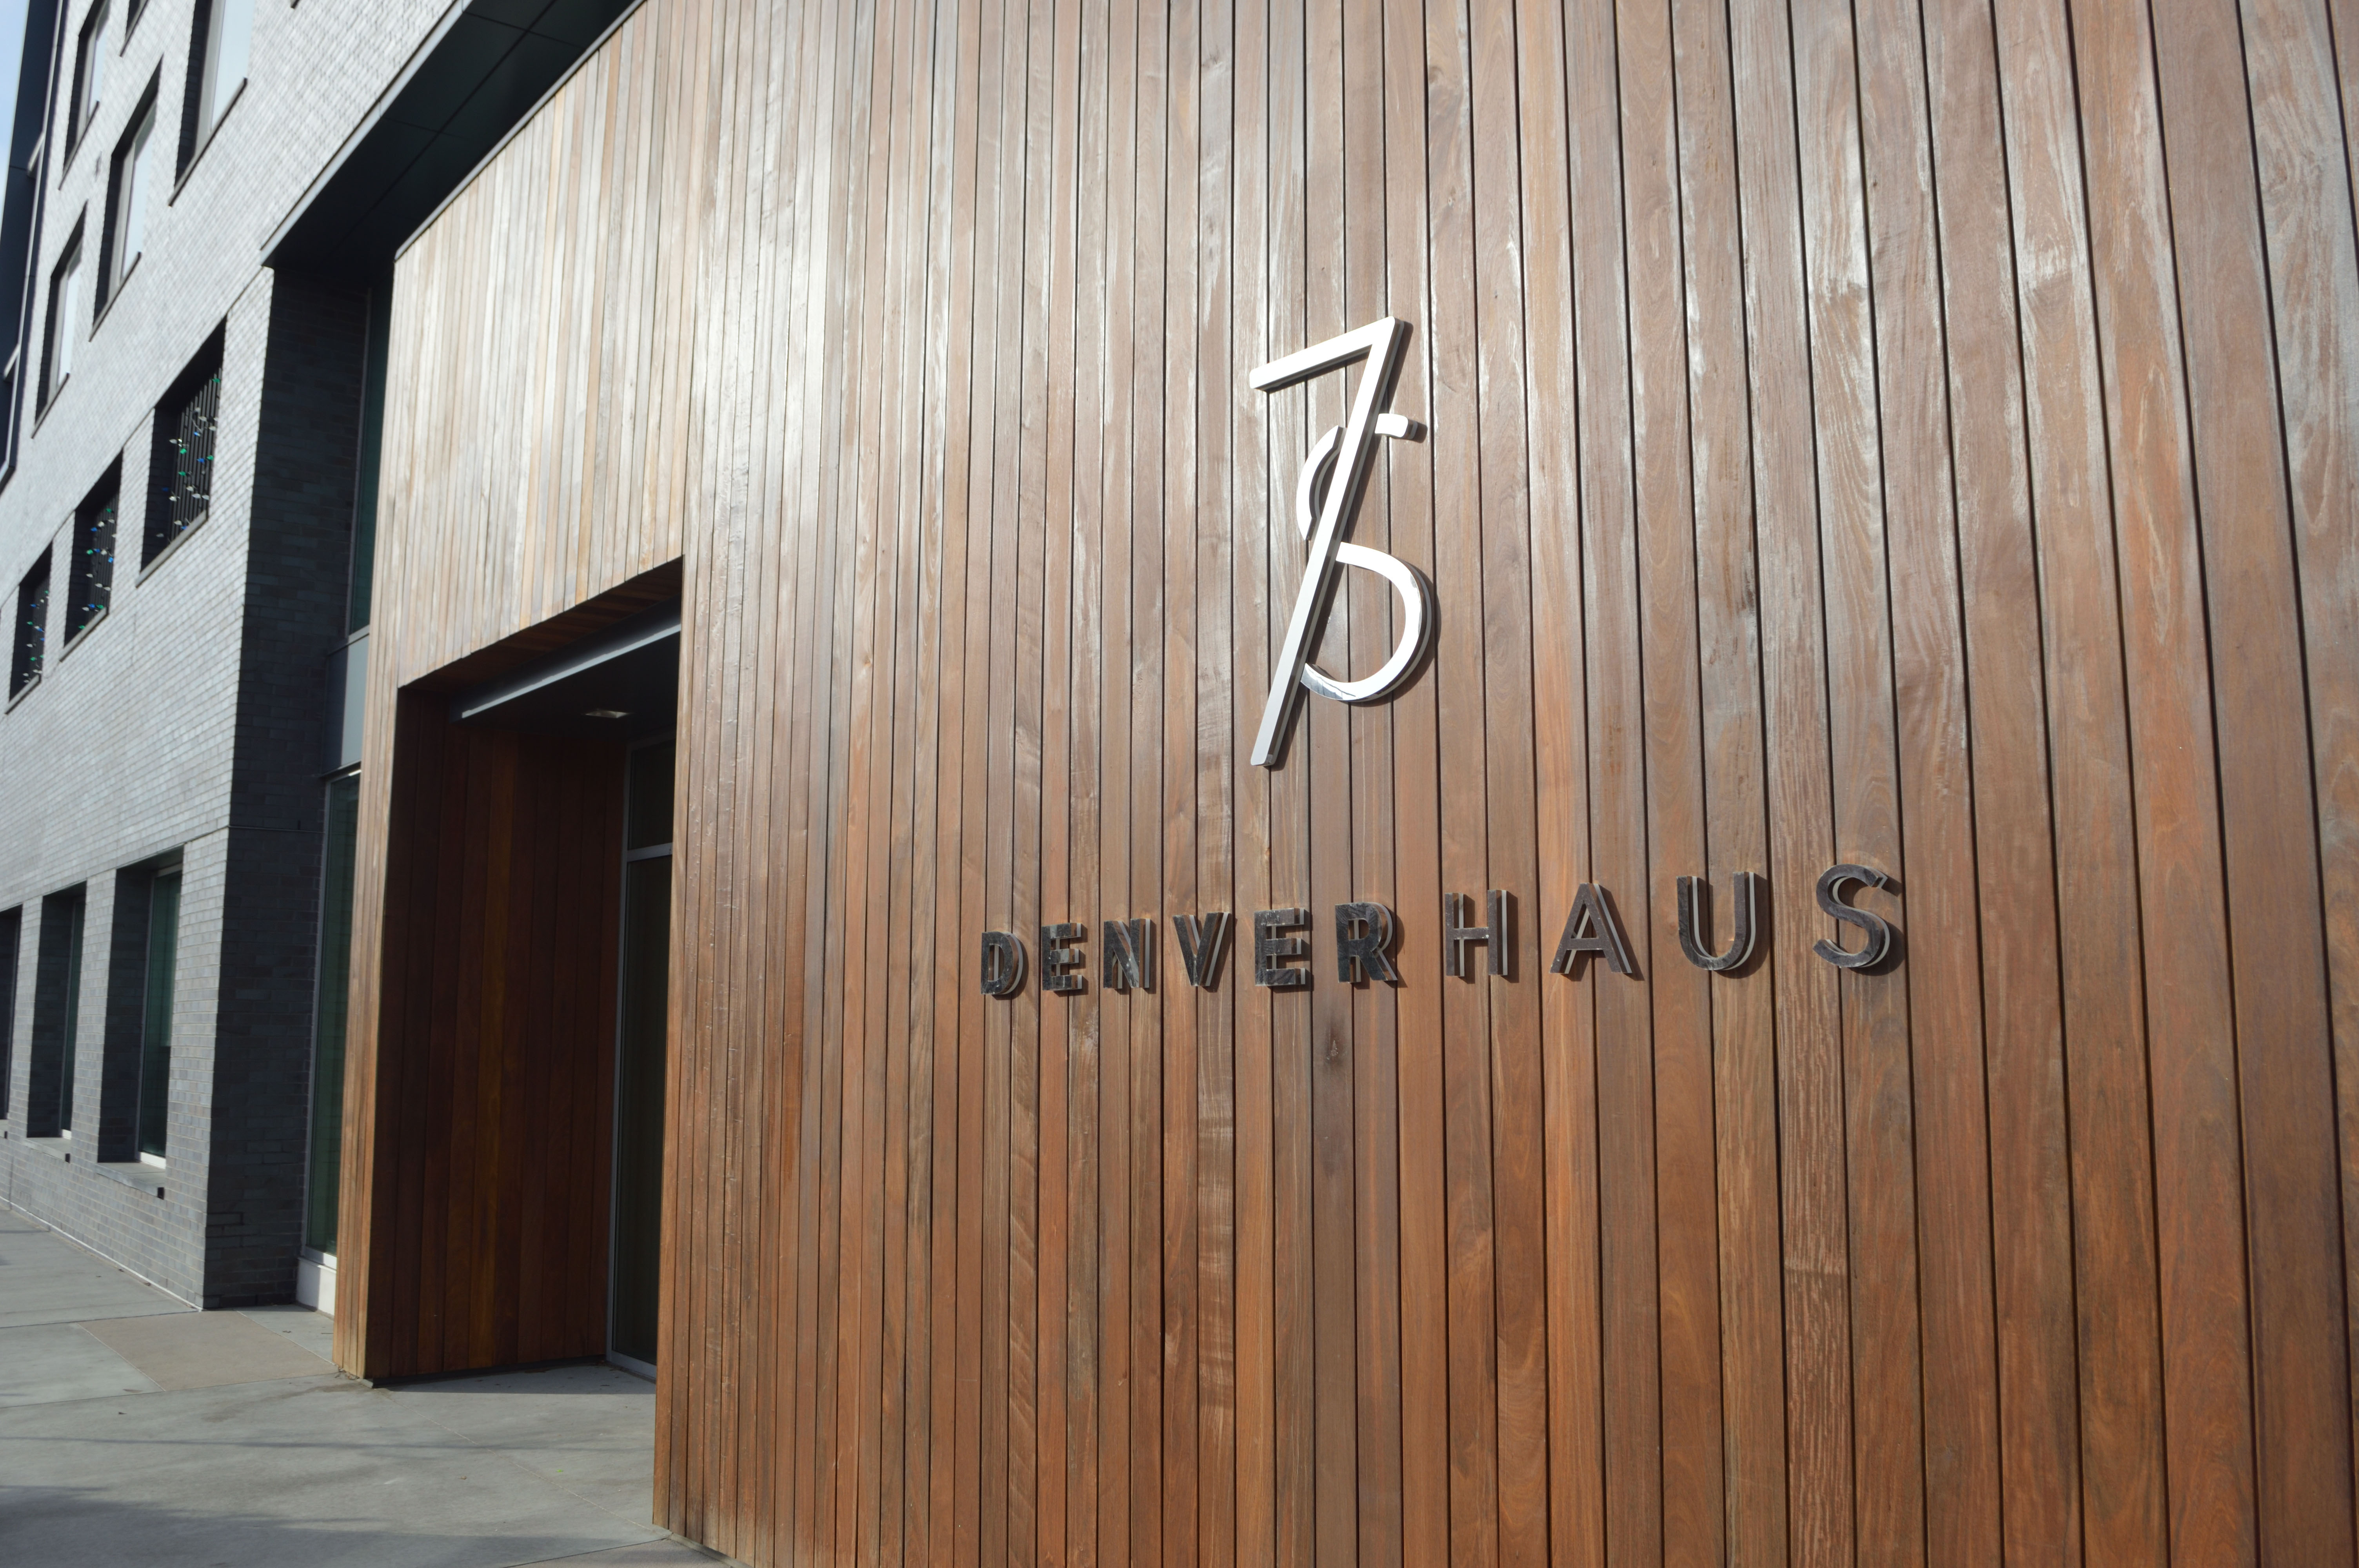 7S Lobby Wall Sign